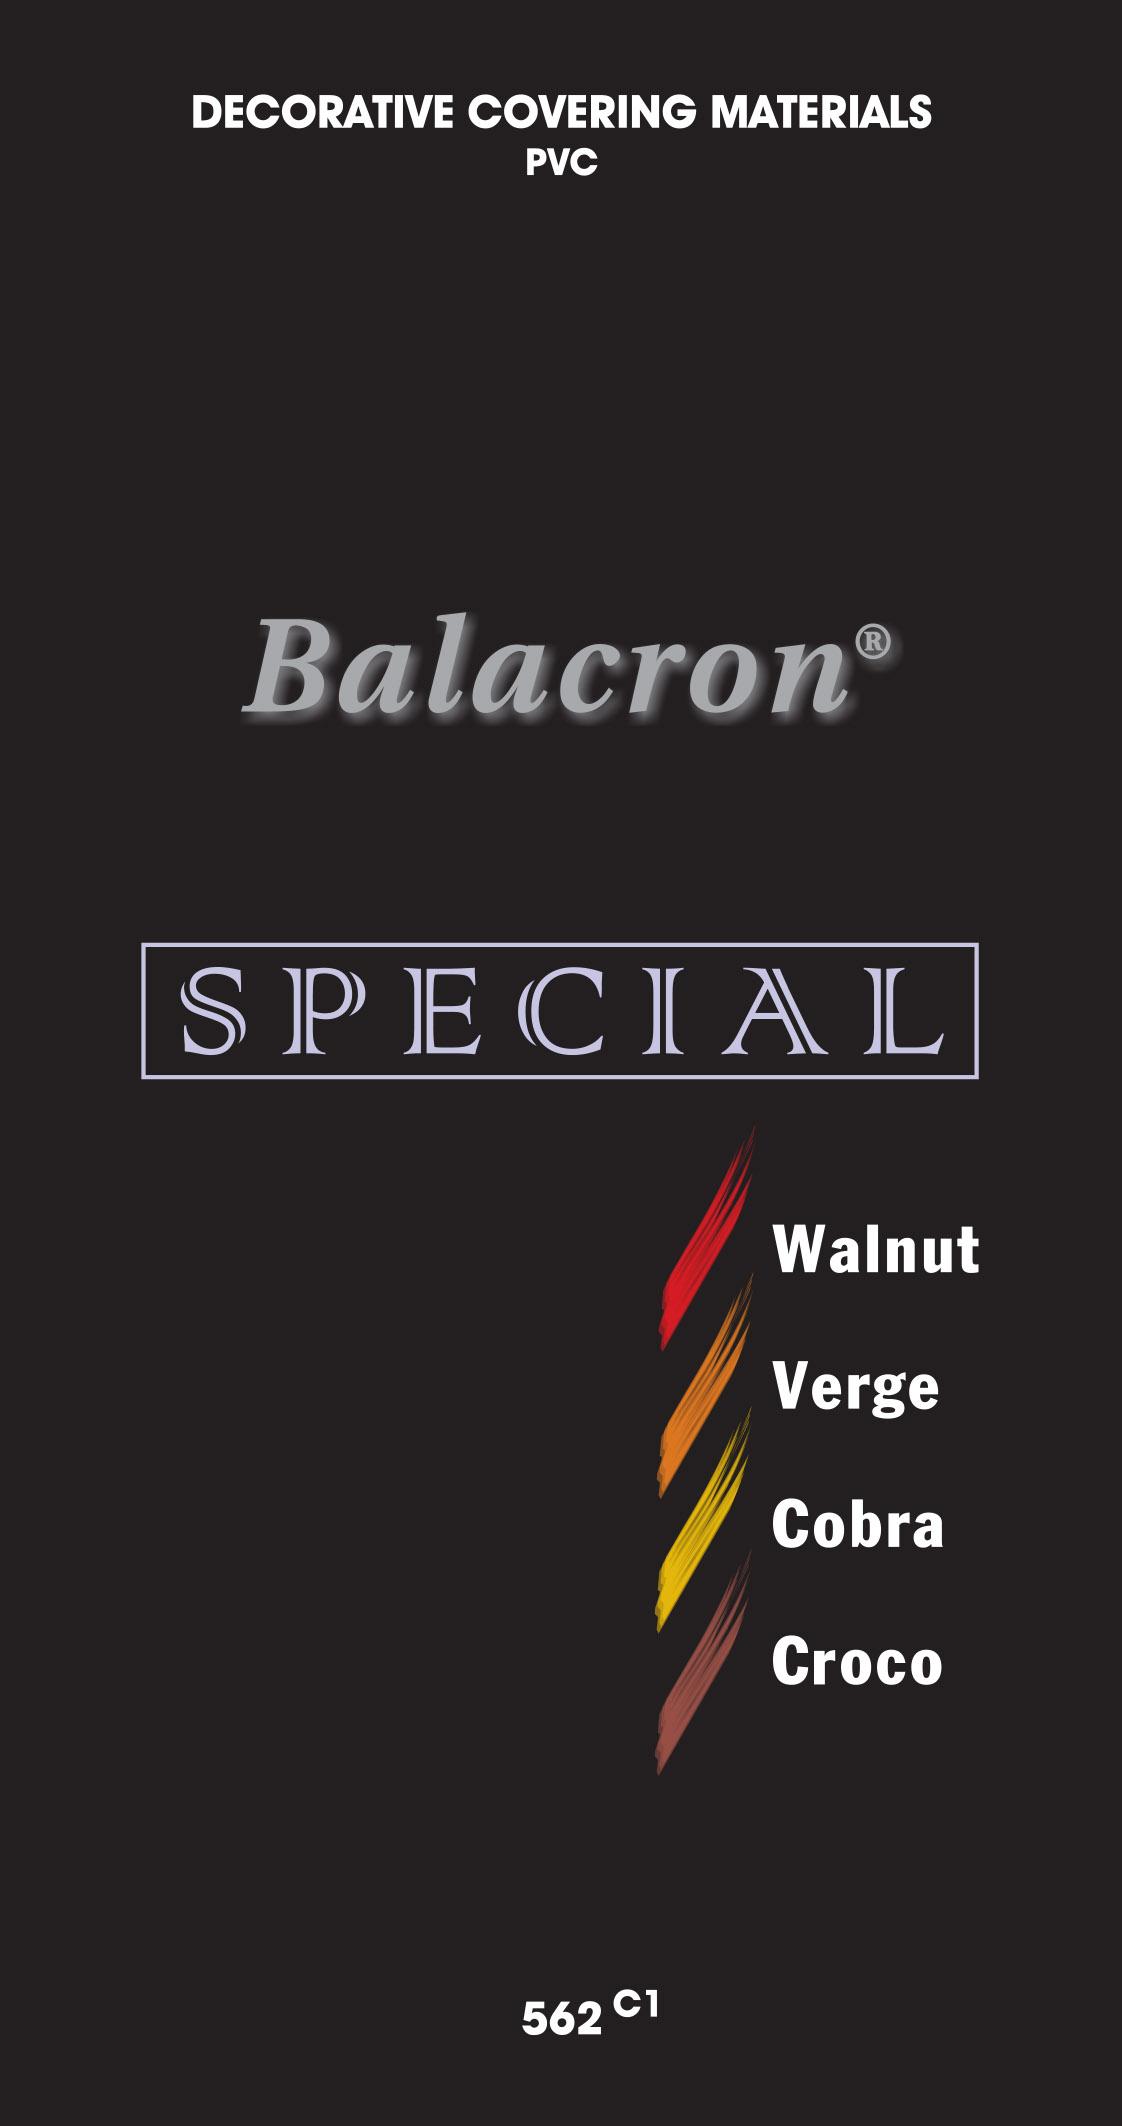 Pt Pentamapan Cemerlang 187 Balacron Special Walnut Verge